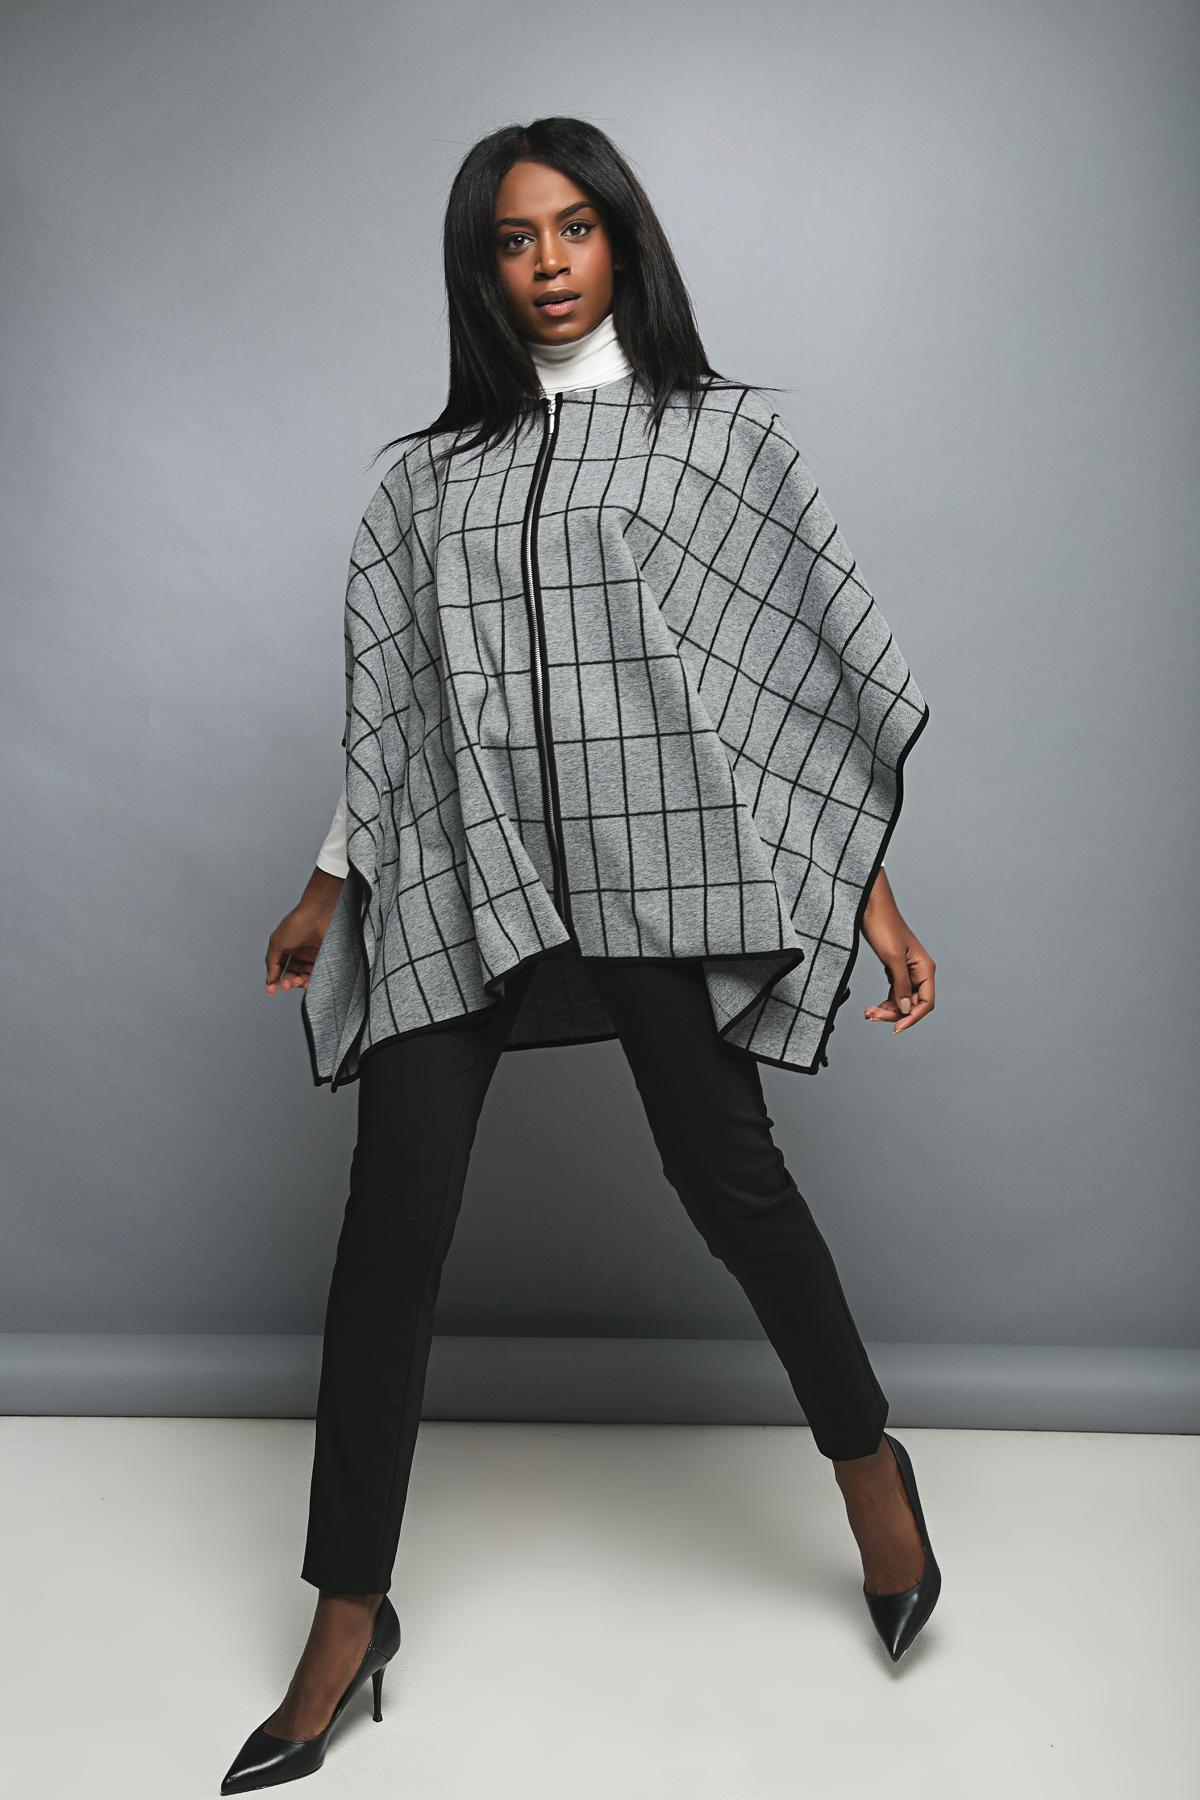 1bae2135a448 PONTONI - Γυναικεία Ρούχα DARLING Mina Siampi Καλαμάτα